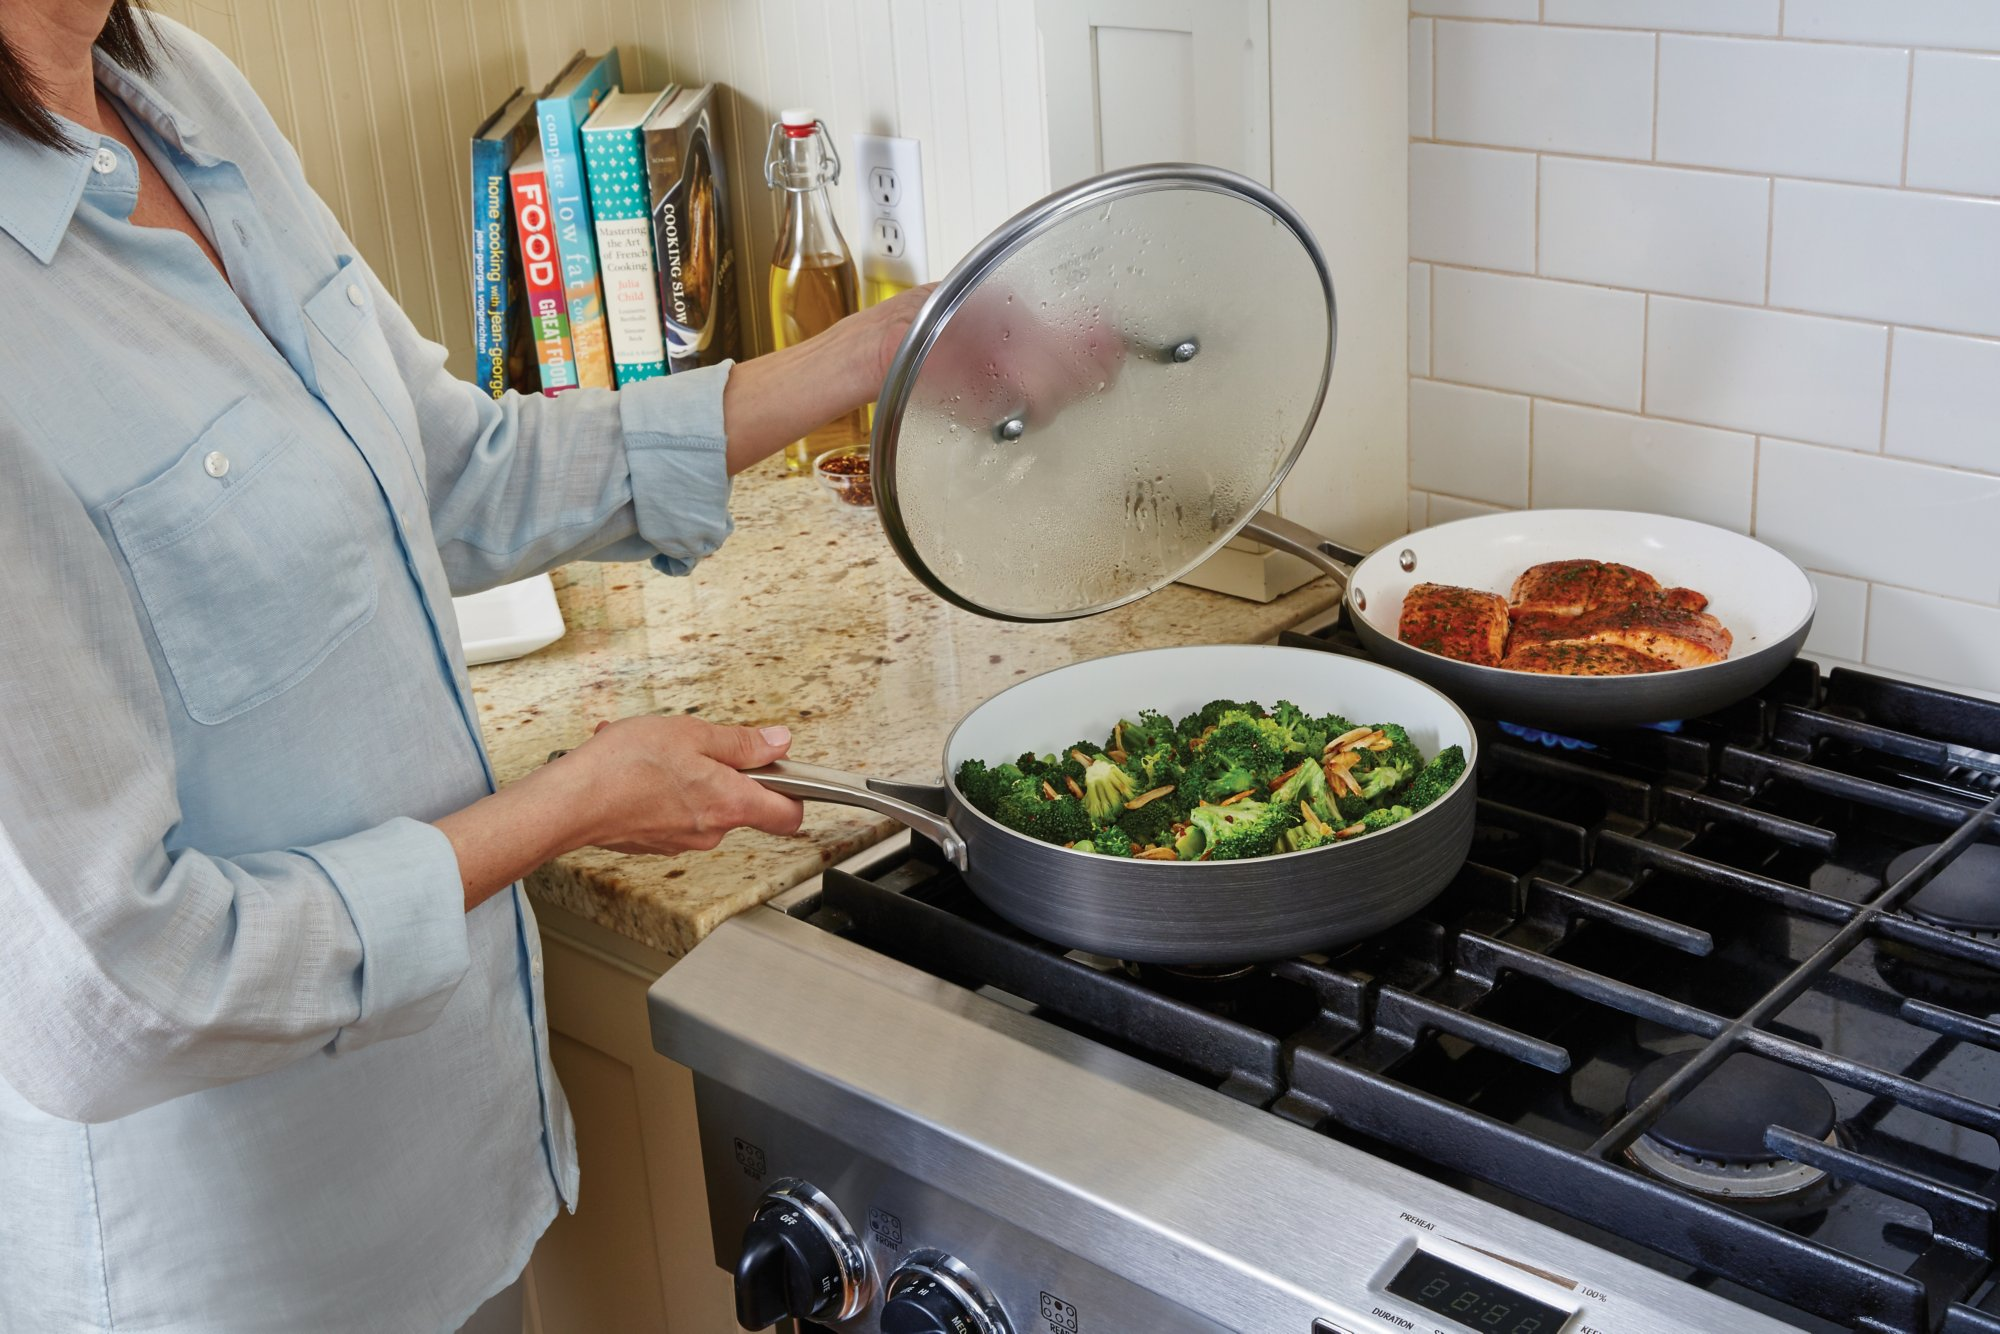 calphalon kitchen essentials countertop inserts classic ceramic nonstick 11 pc cookware set